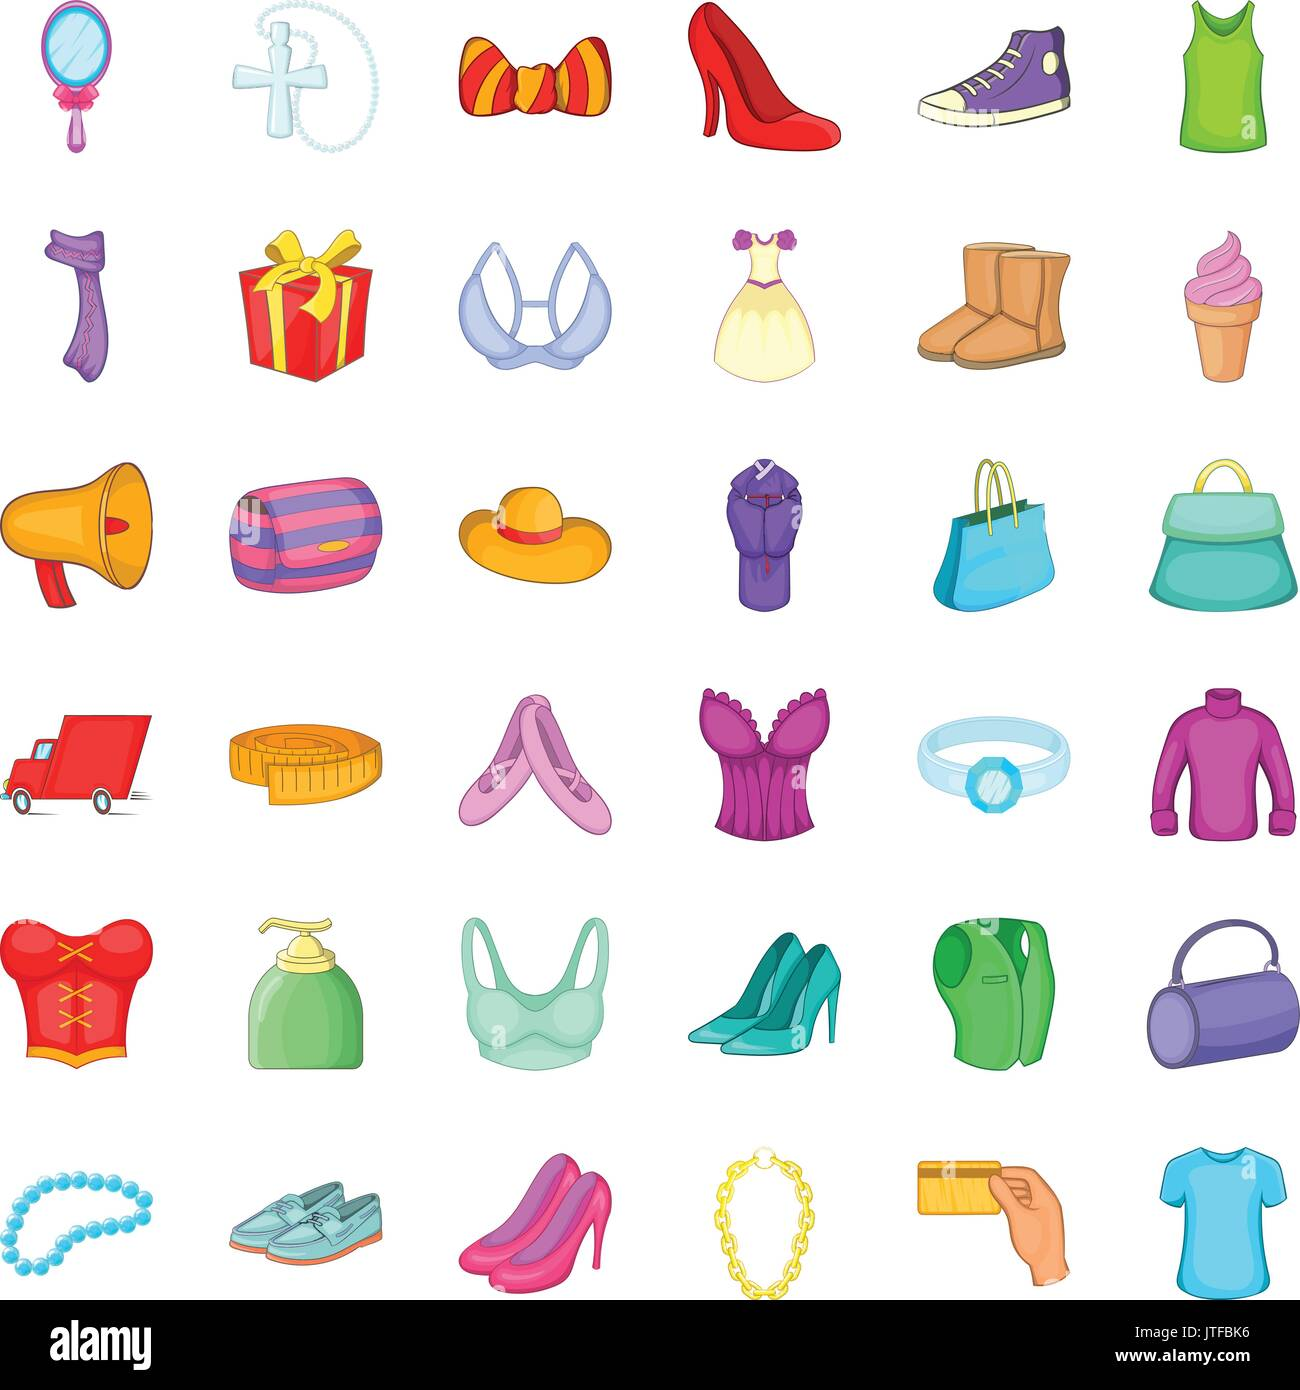 Woman Shoe Icons Set Cartoon Style Stock Vector Art Illustration